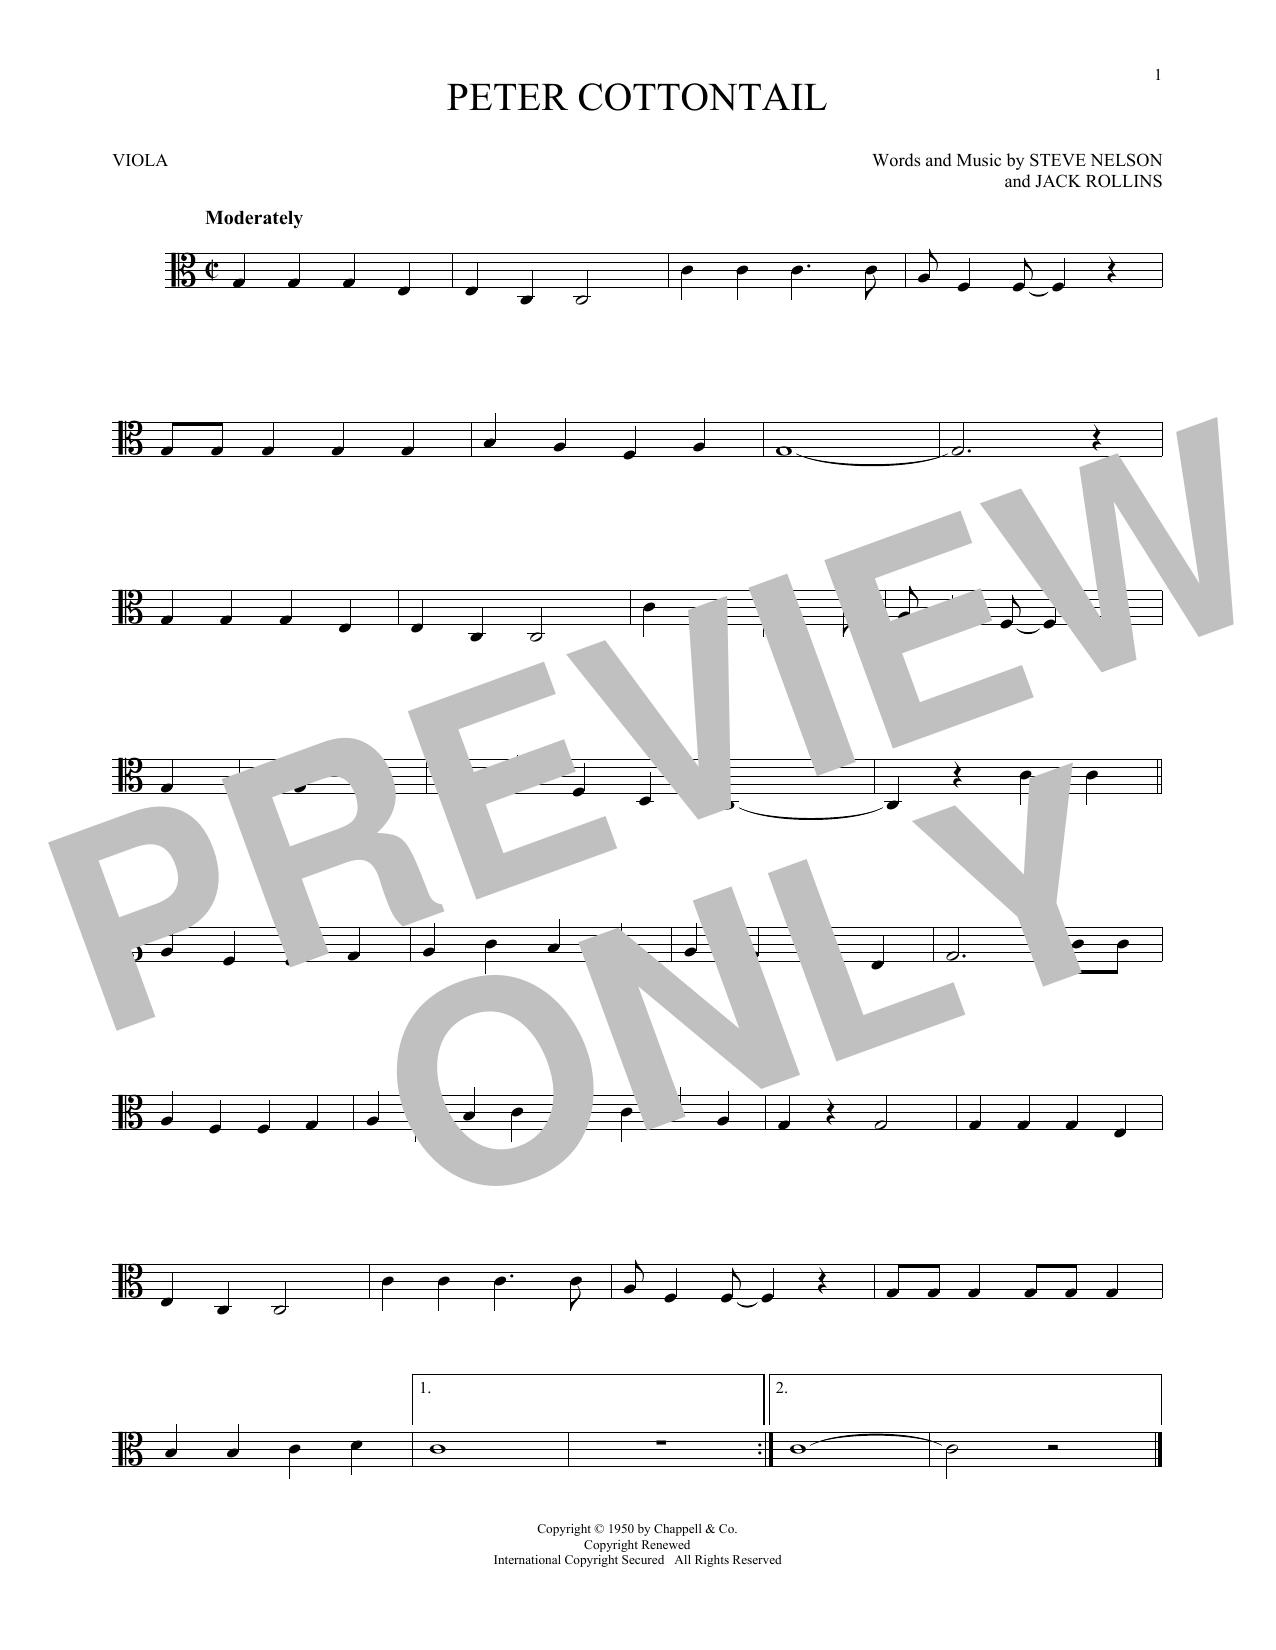 Peter Cottontail Sheet Music